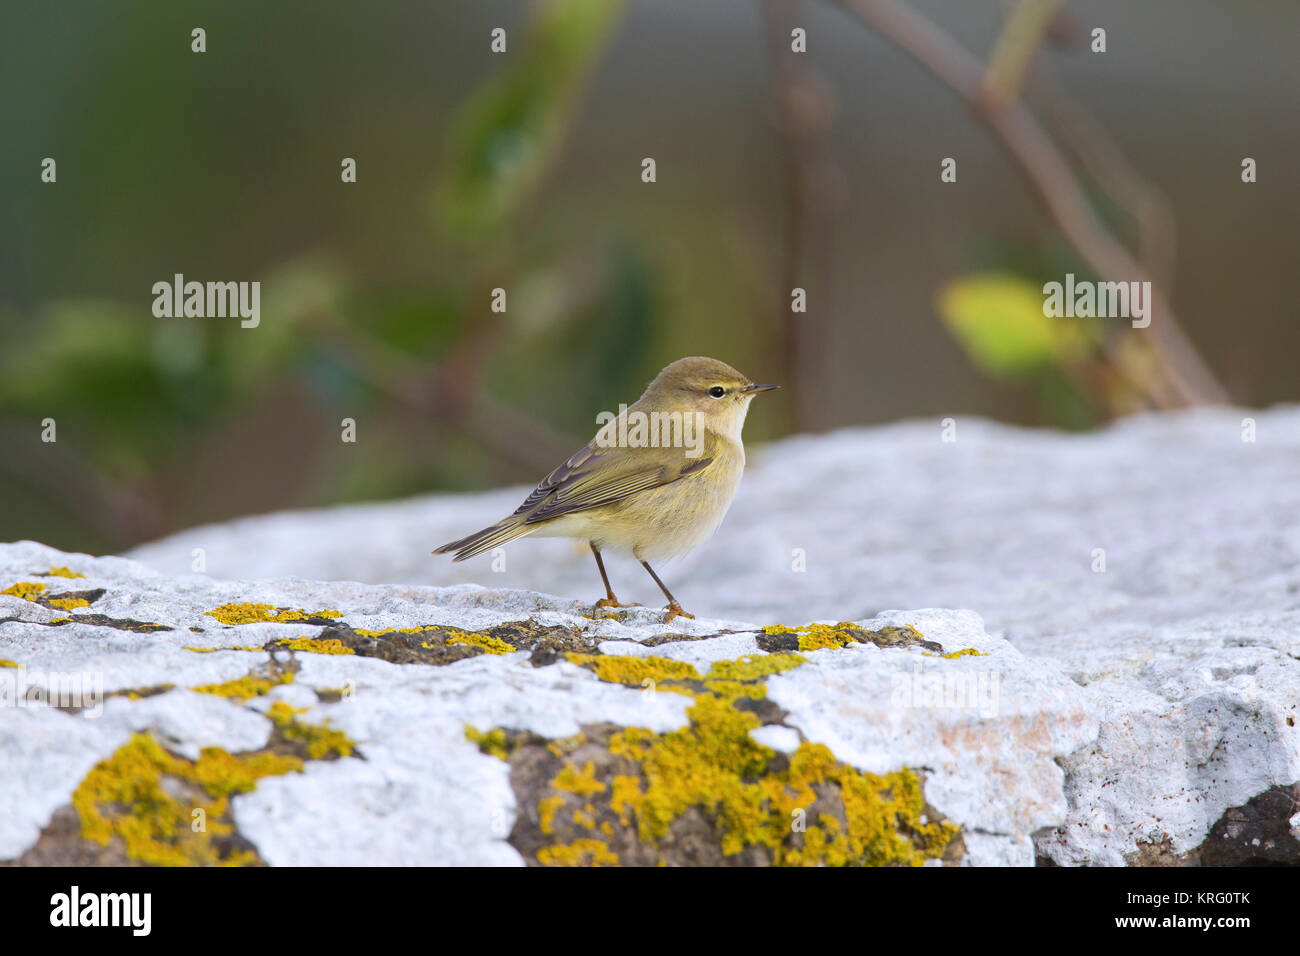 Siberian chiffchaff (Phylloscopus collybita tristis / Phylloscopus tristis) perched on rock in autumn, Sweden - Stock Image